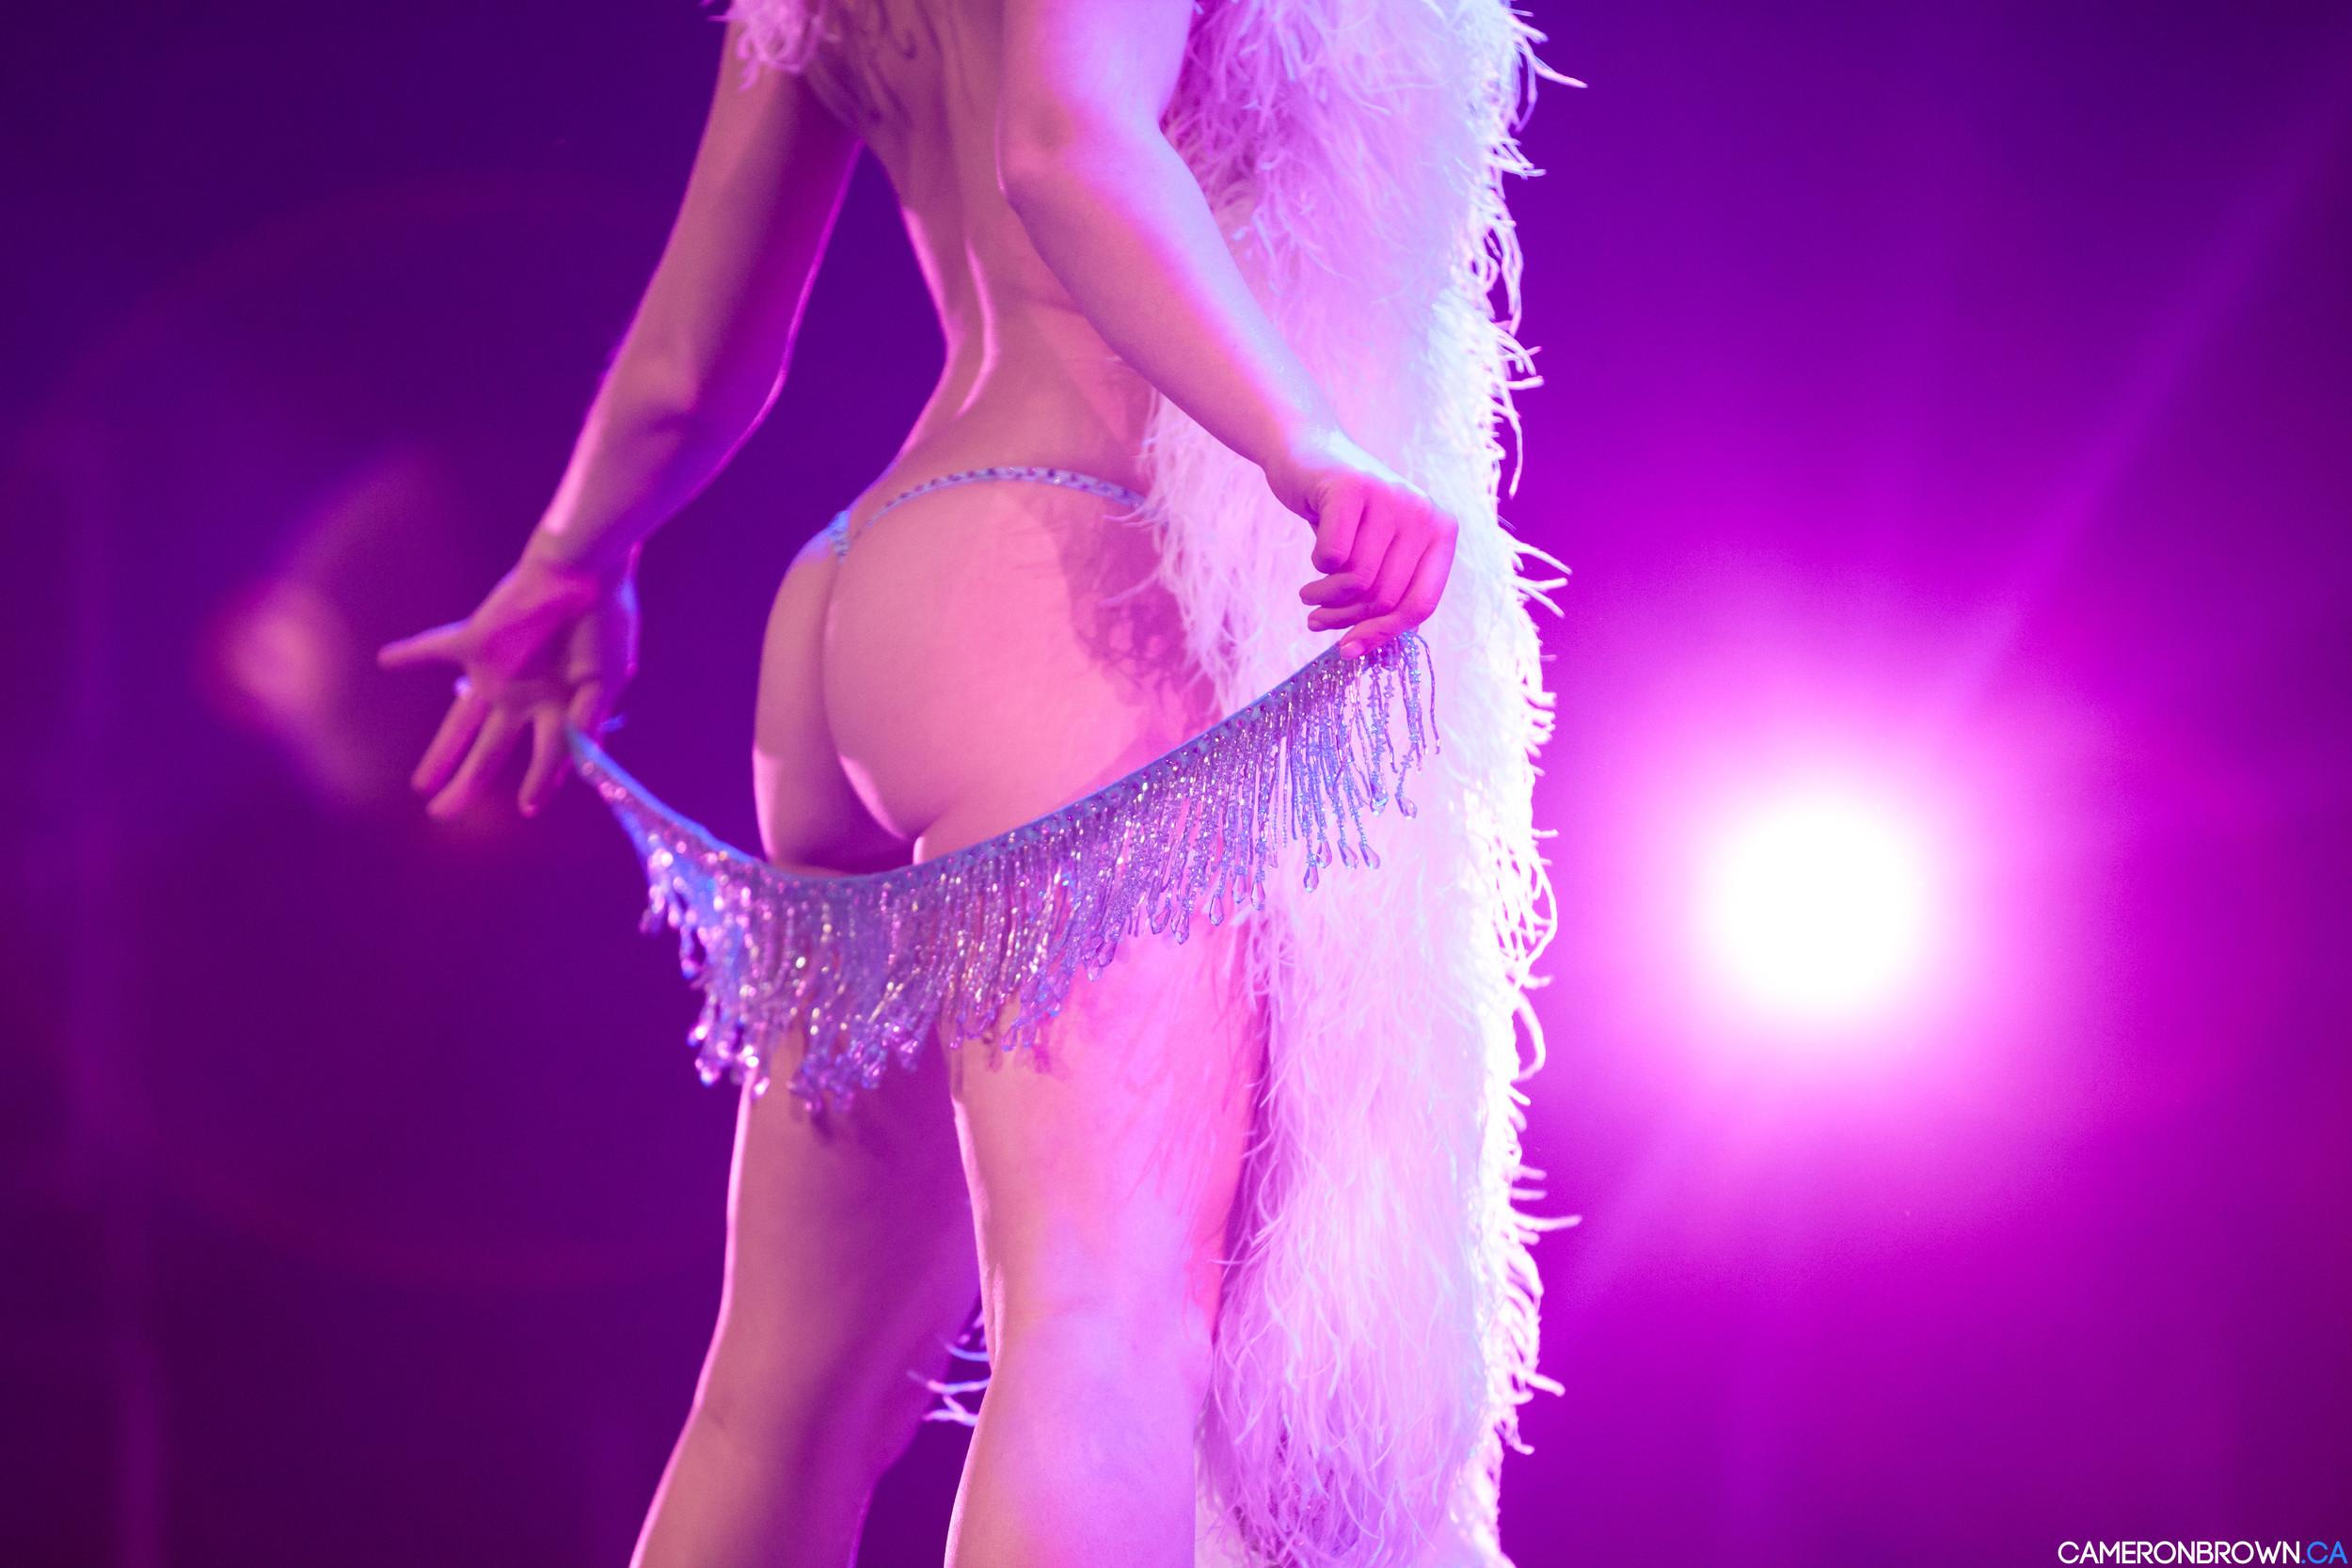 2013 Vancouver International Burlesque Festival. Photo by Cameron Brown